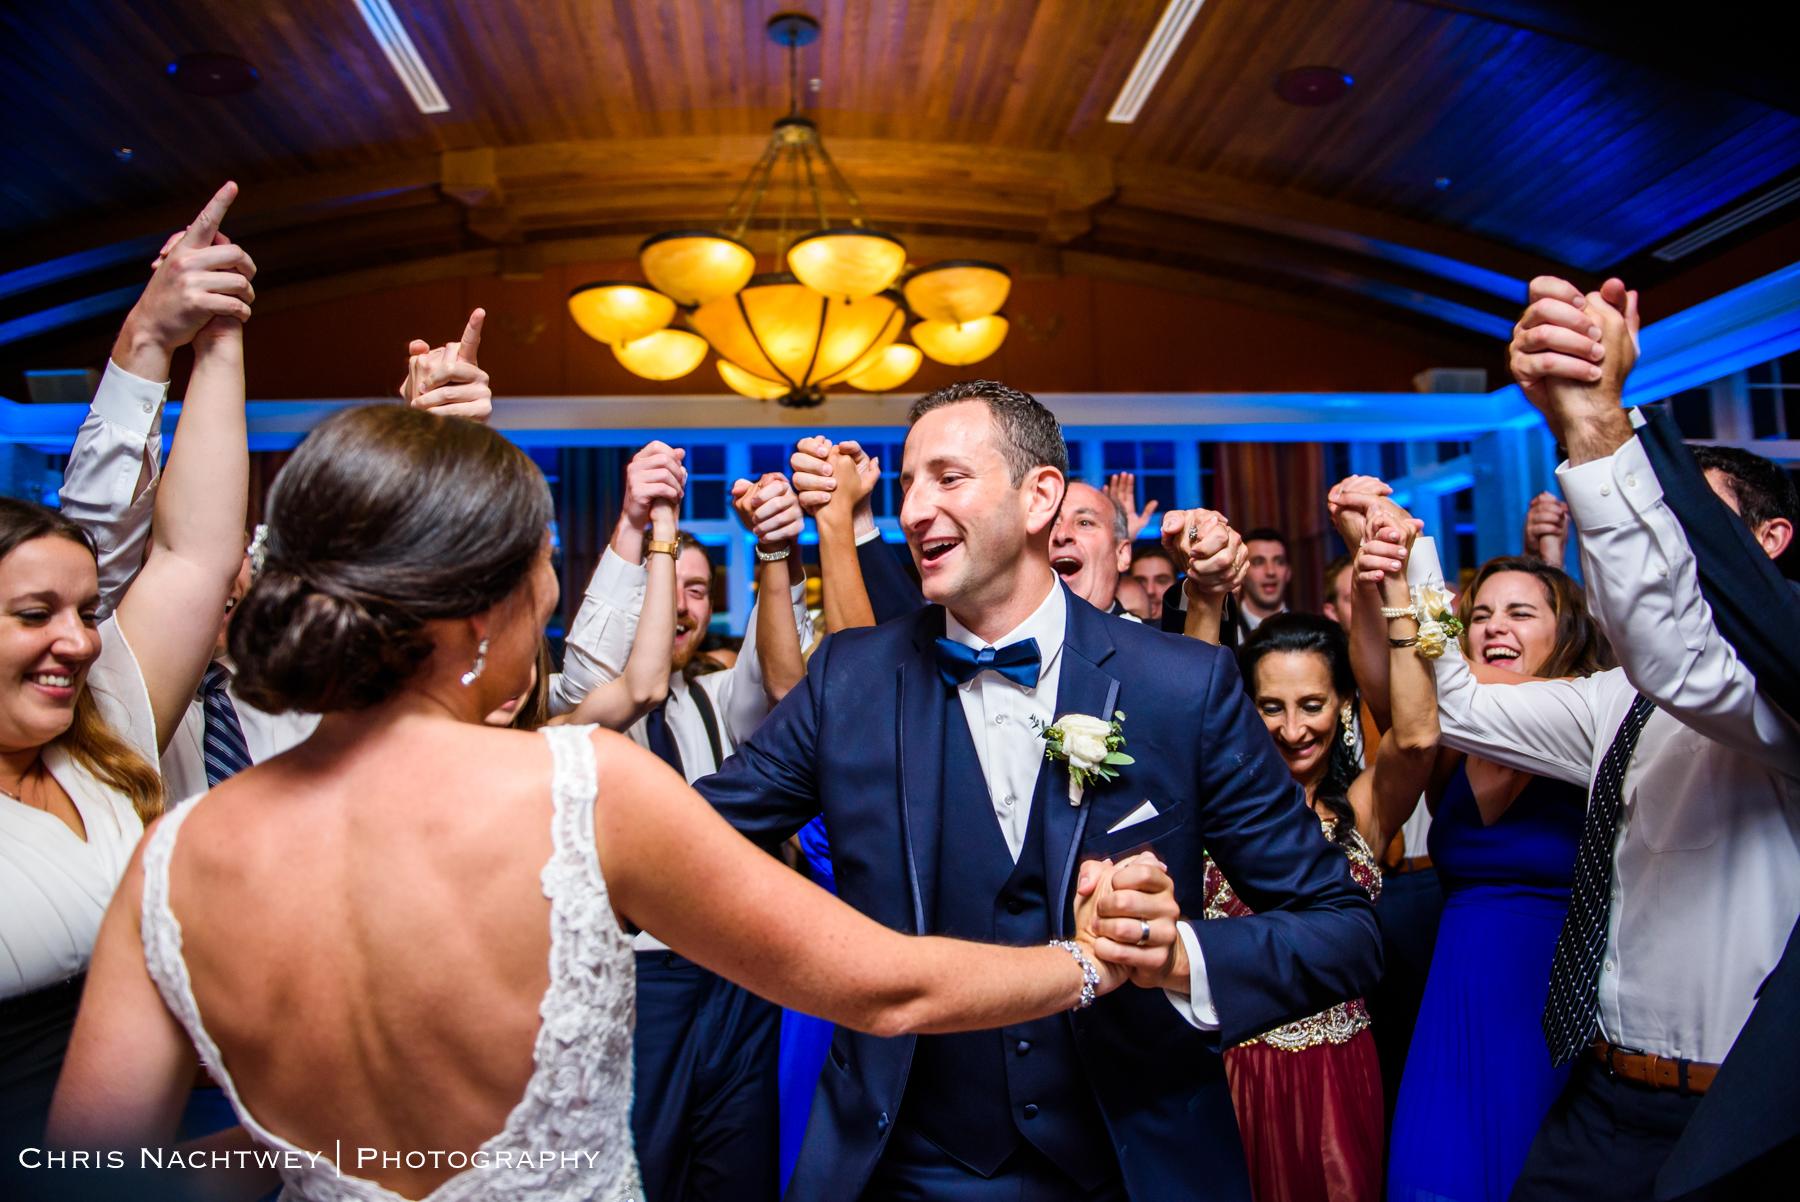 wedding-lake-of-isles-photos-chris-nachtwey-photography-2019-55.jpg